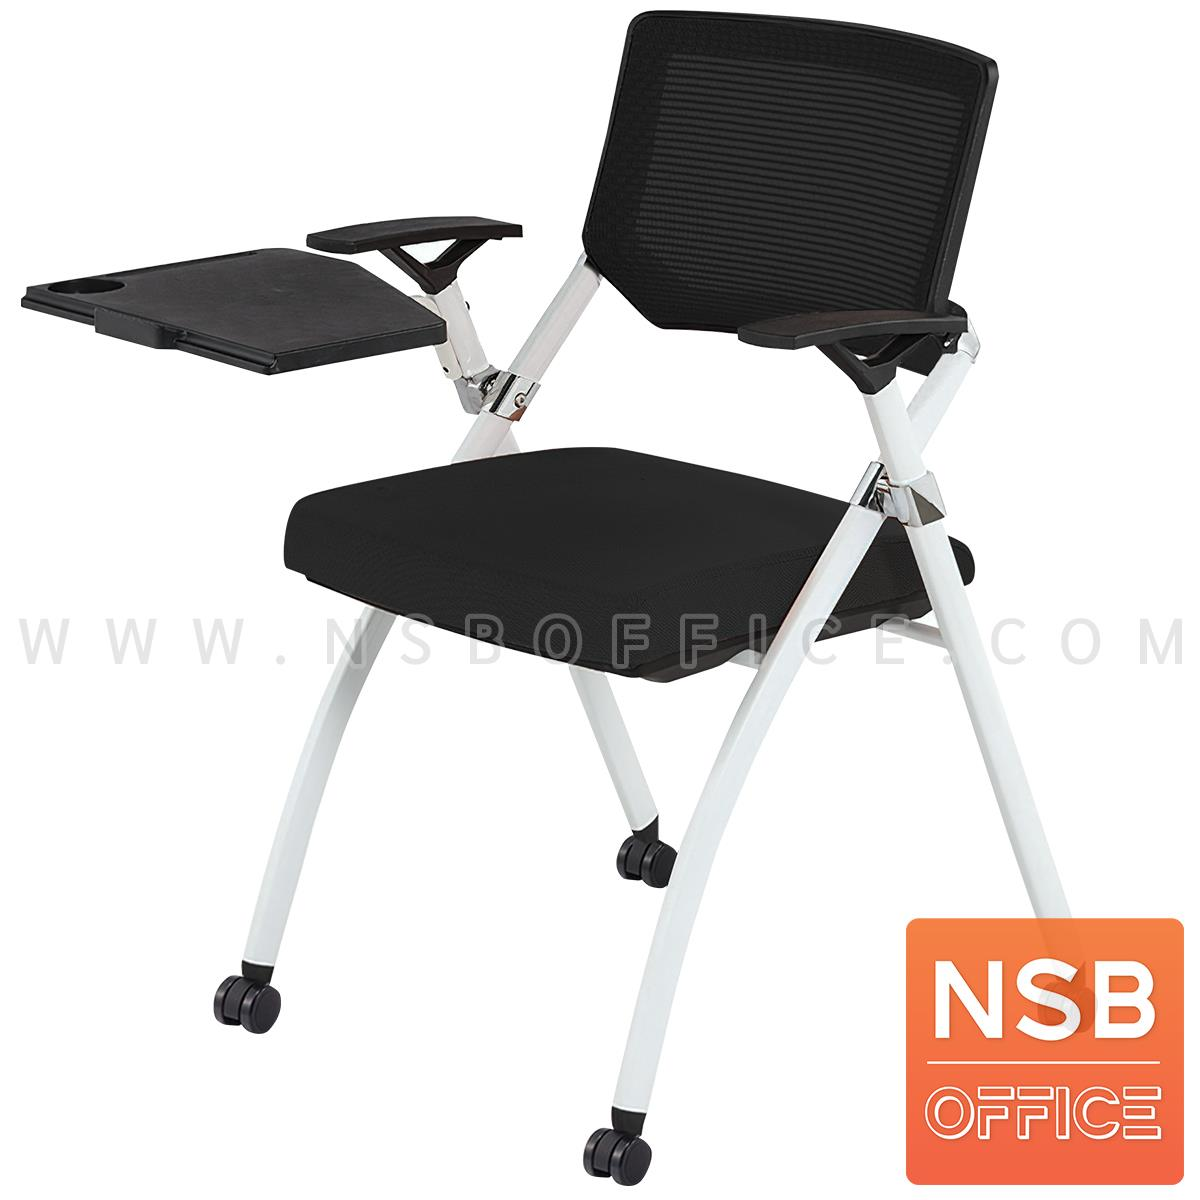 B07A092:เก้าอี้เลคเชอร์หลังเน็ตล้อเลื่อน รุ่น Halle (แฮลลี)  ขาเหล็กพ่นสีขาว